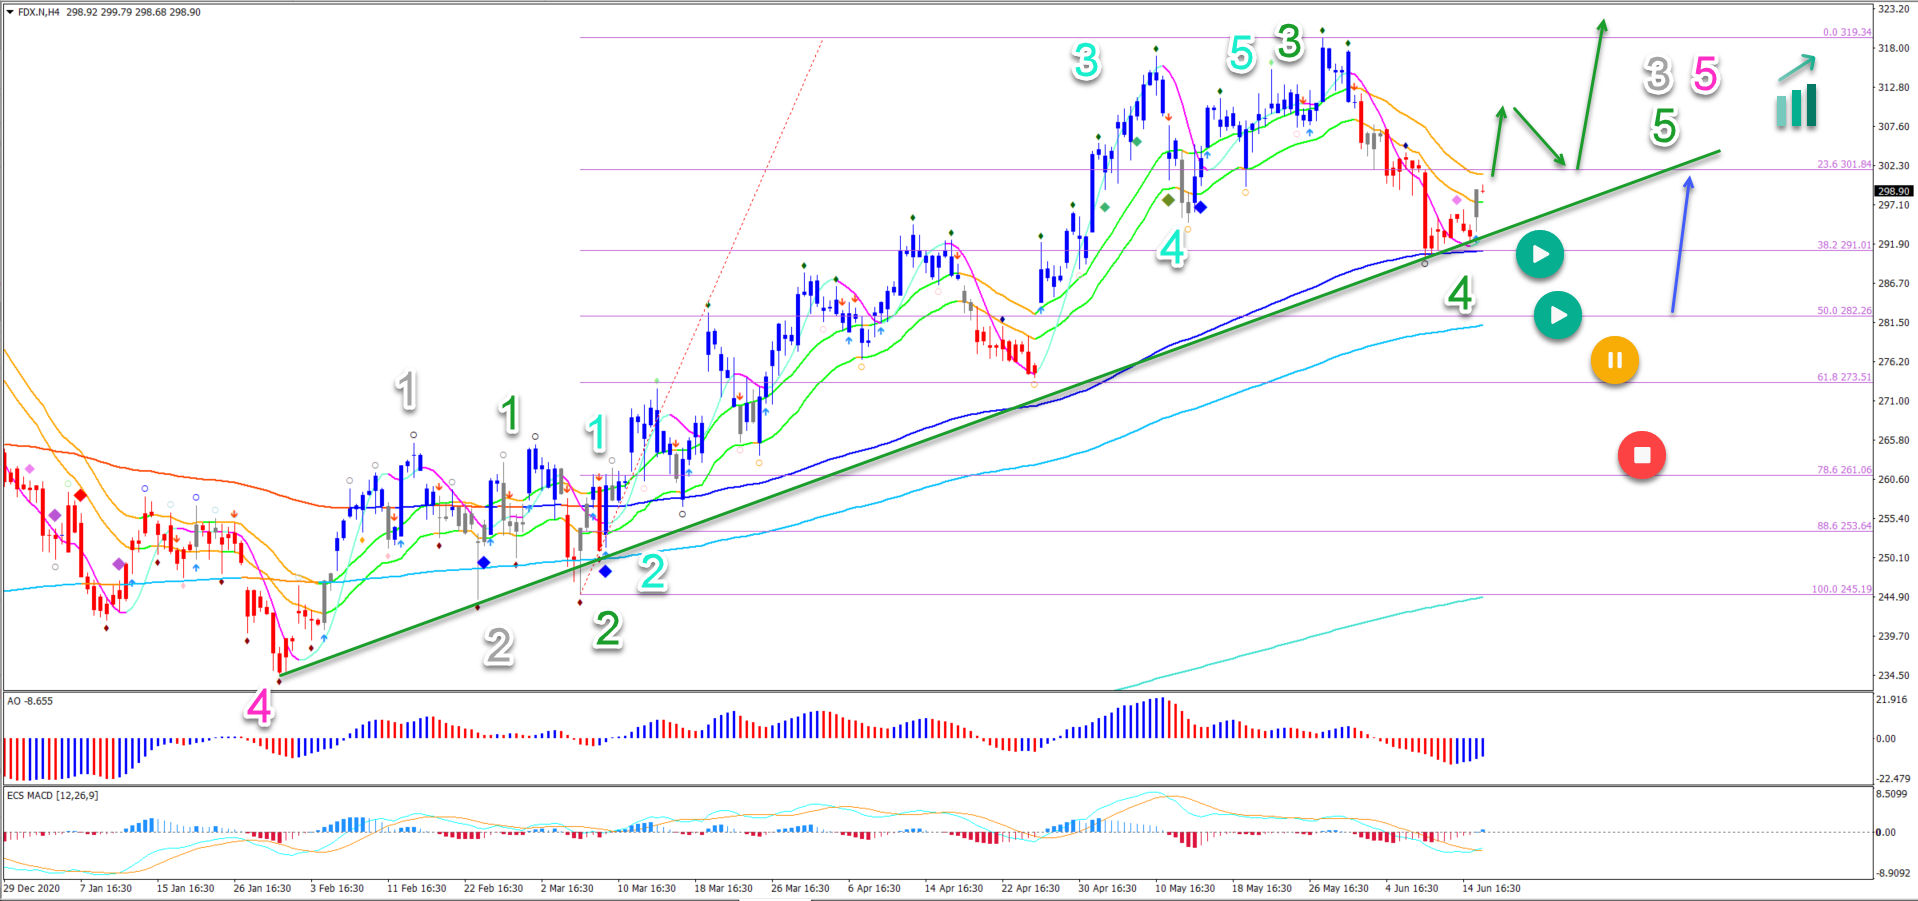 Fedex 16.06.2021 4 hour chart